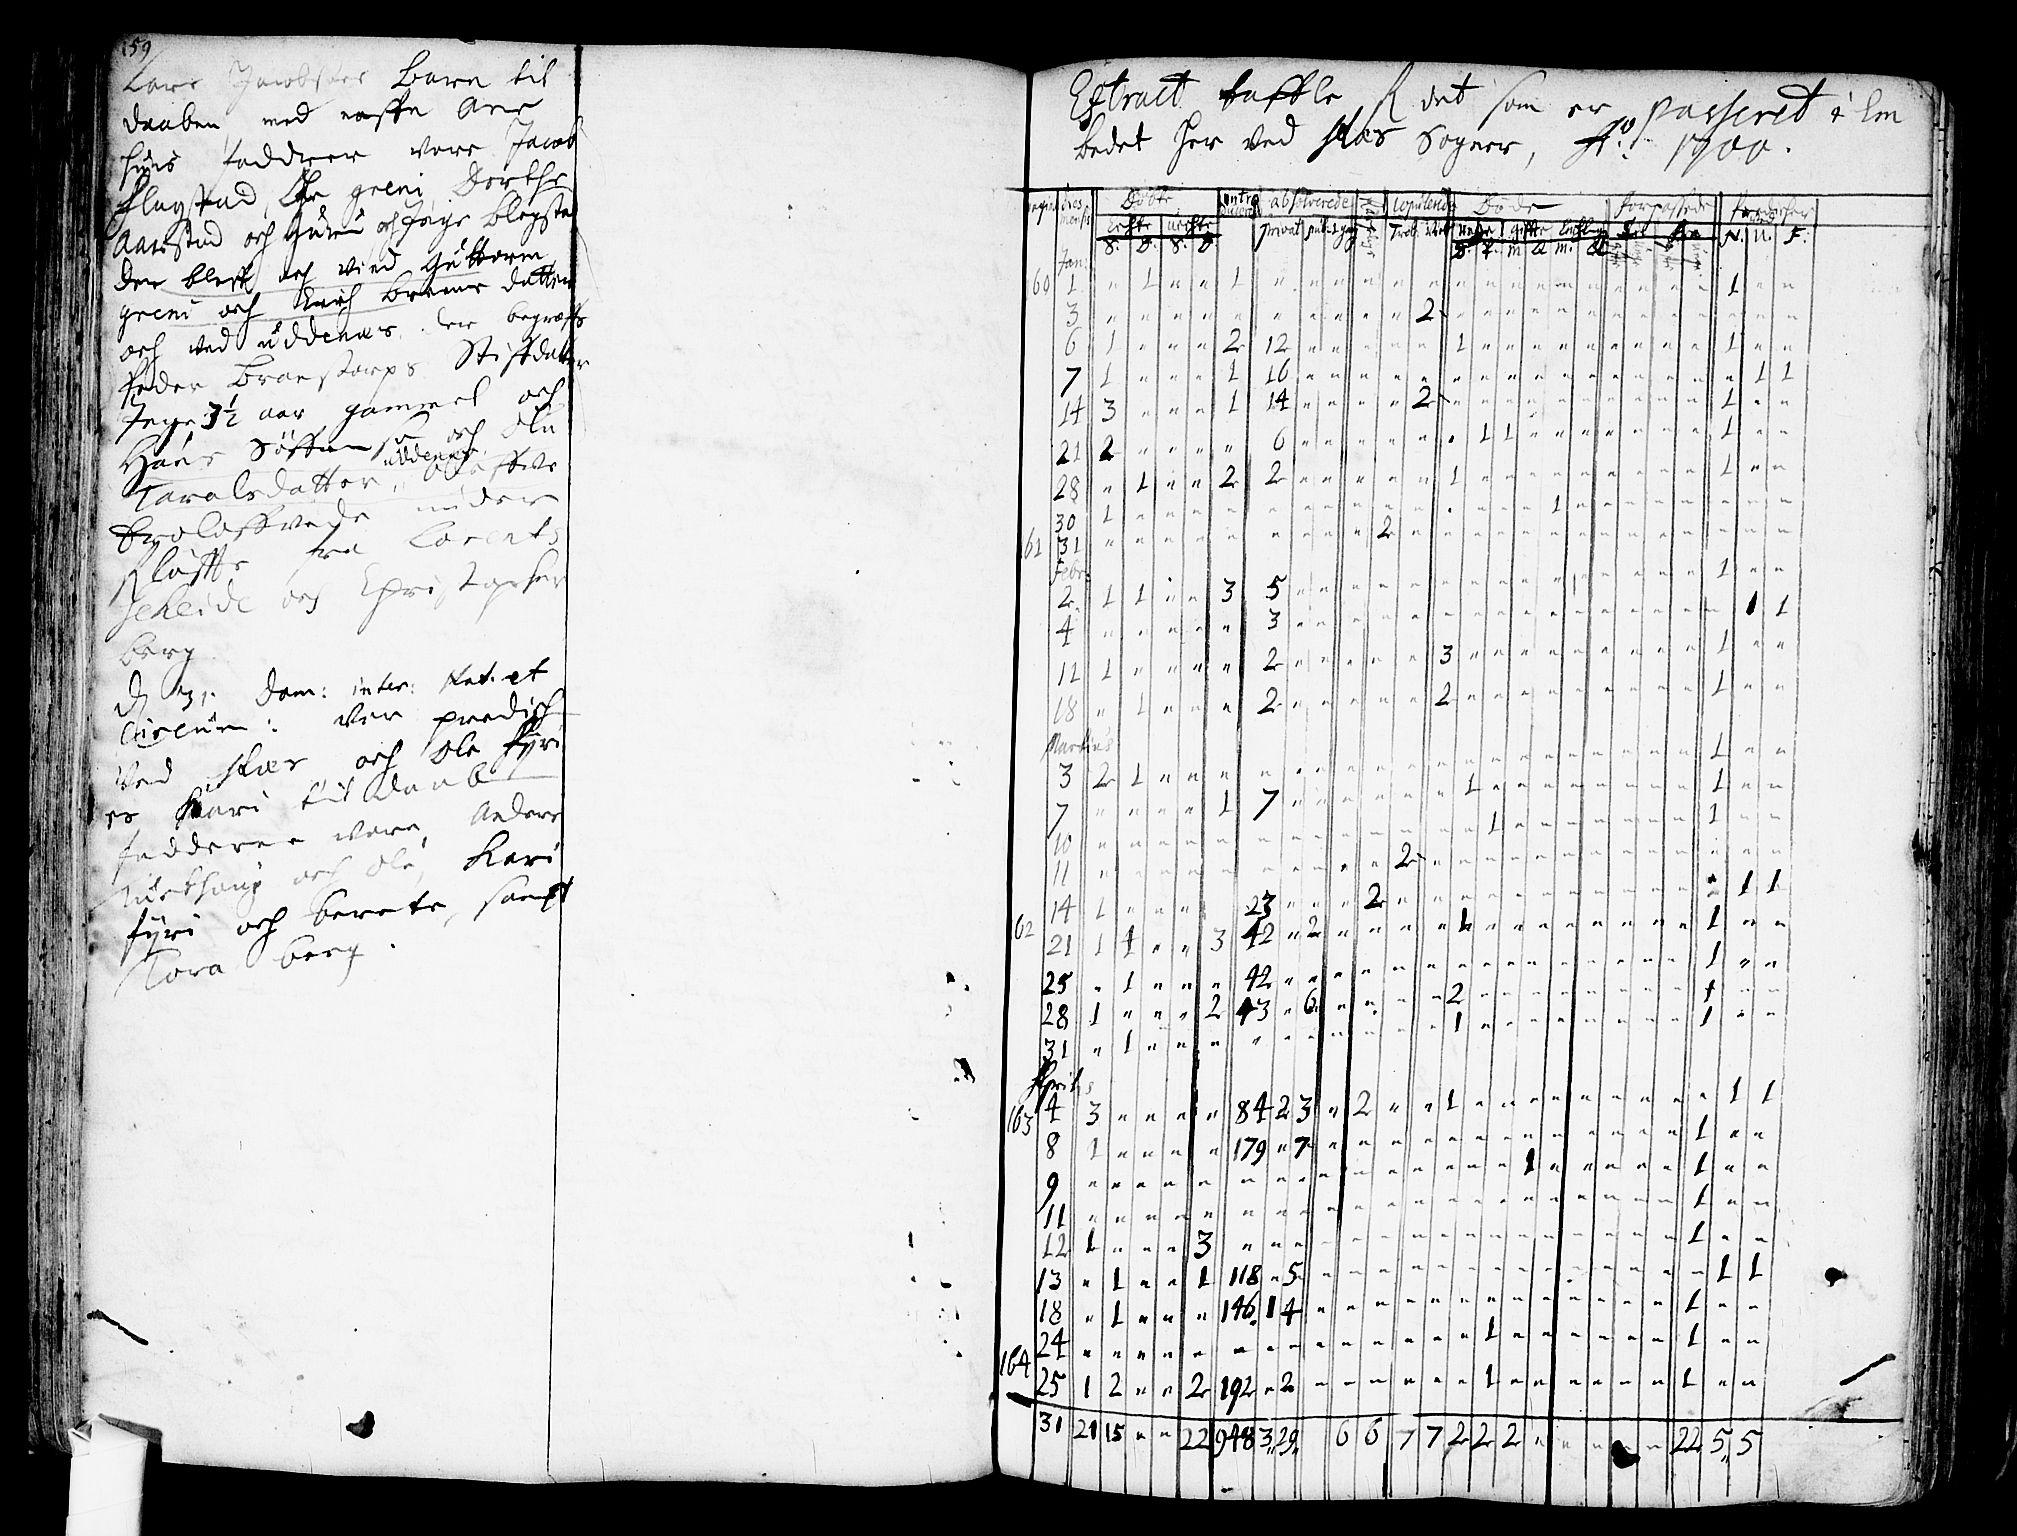 SAO, Nes prestekontor Kirkebøker, F/Fa/L0001: Parish register (official) no. I 1, 1689-1716, p. 159a-159b